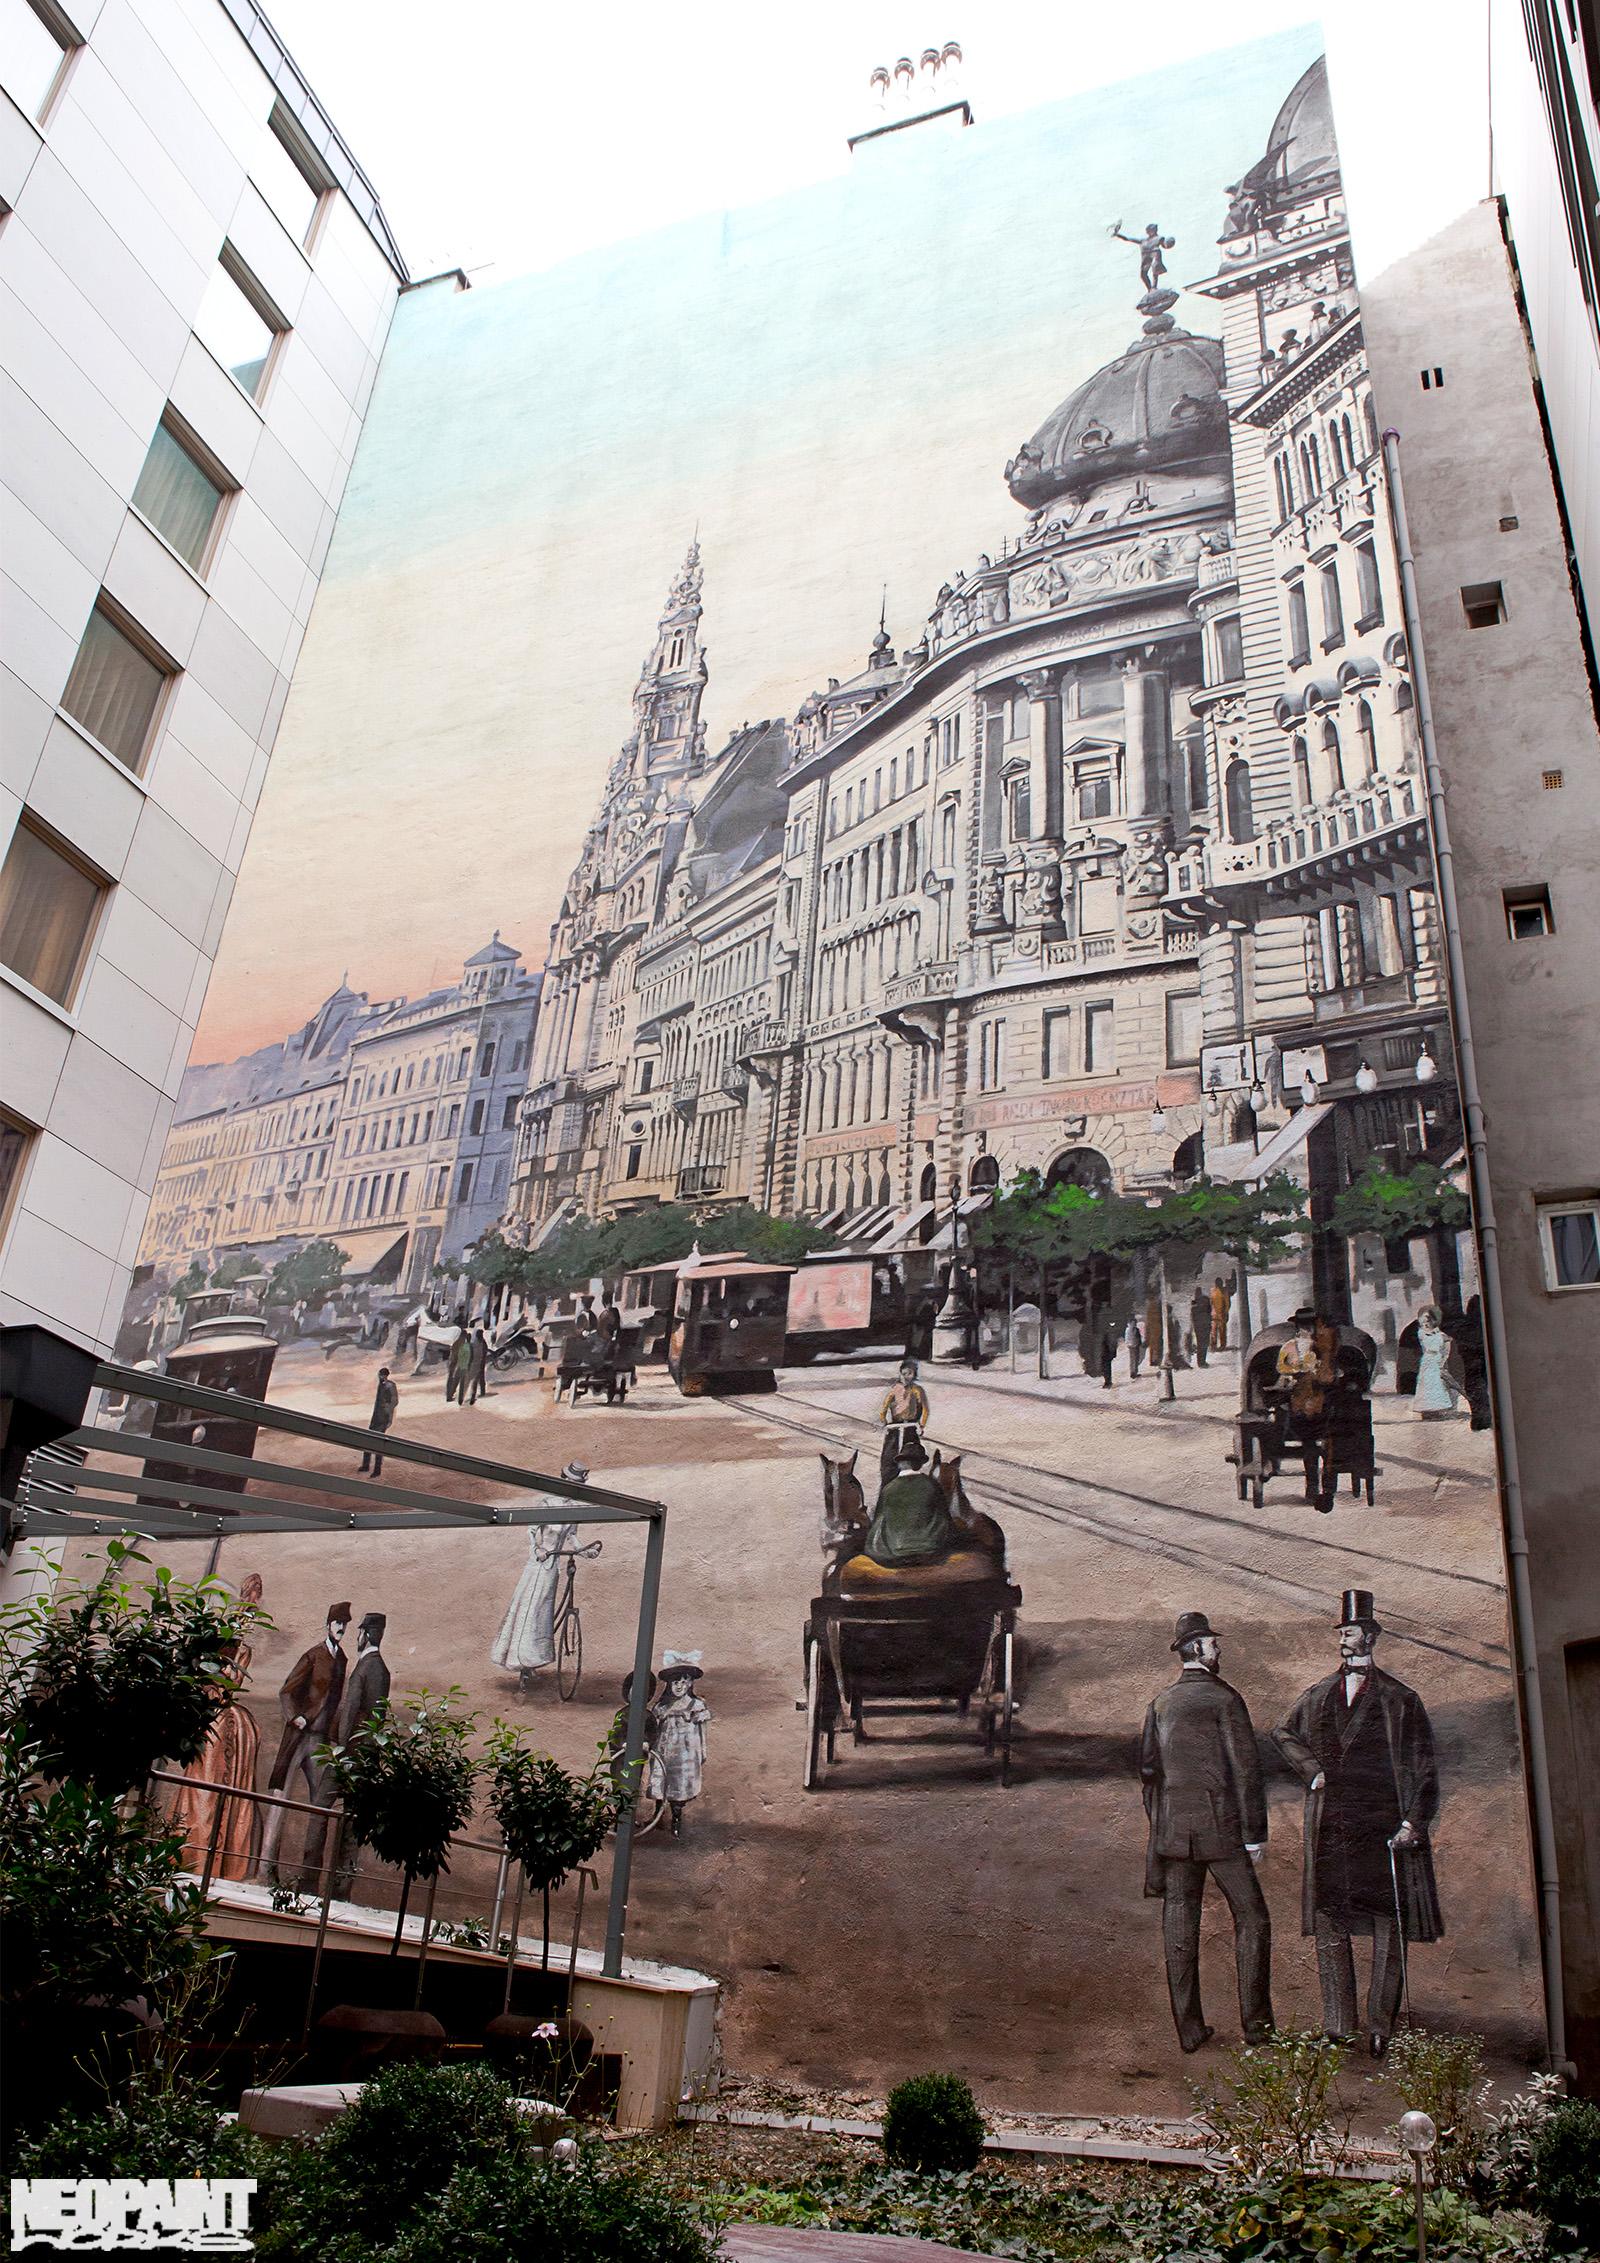 neopaint works - művészi falfestmény falon - zara hotel